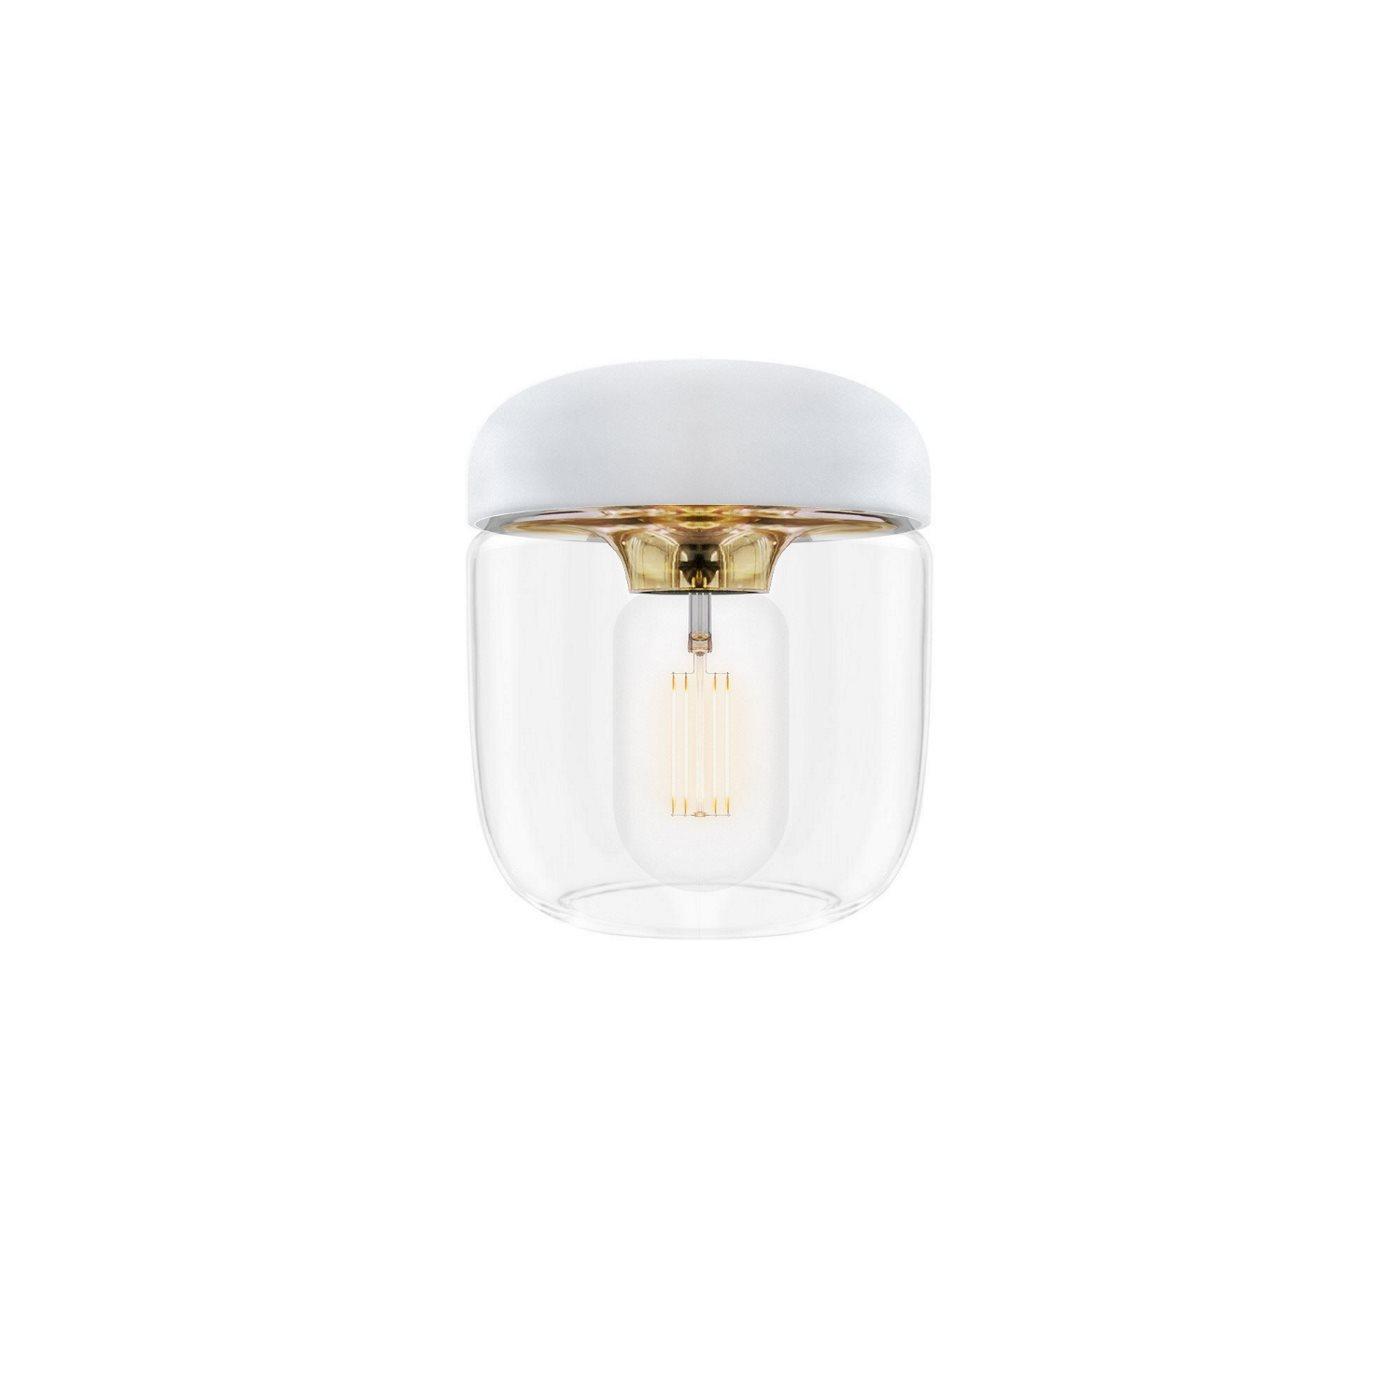 Acorn lampa white brass, Vita